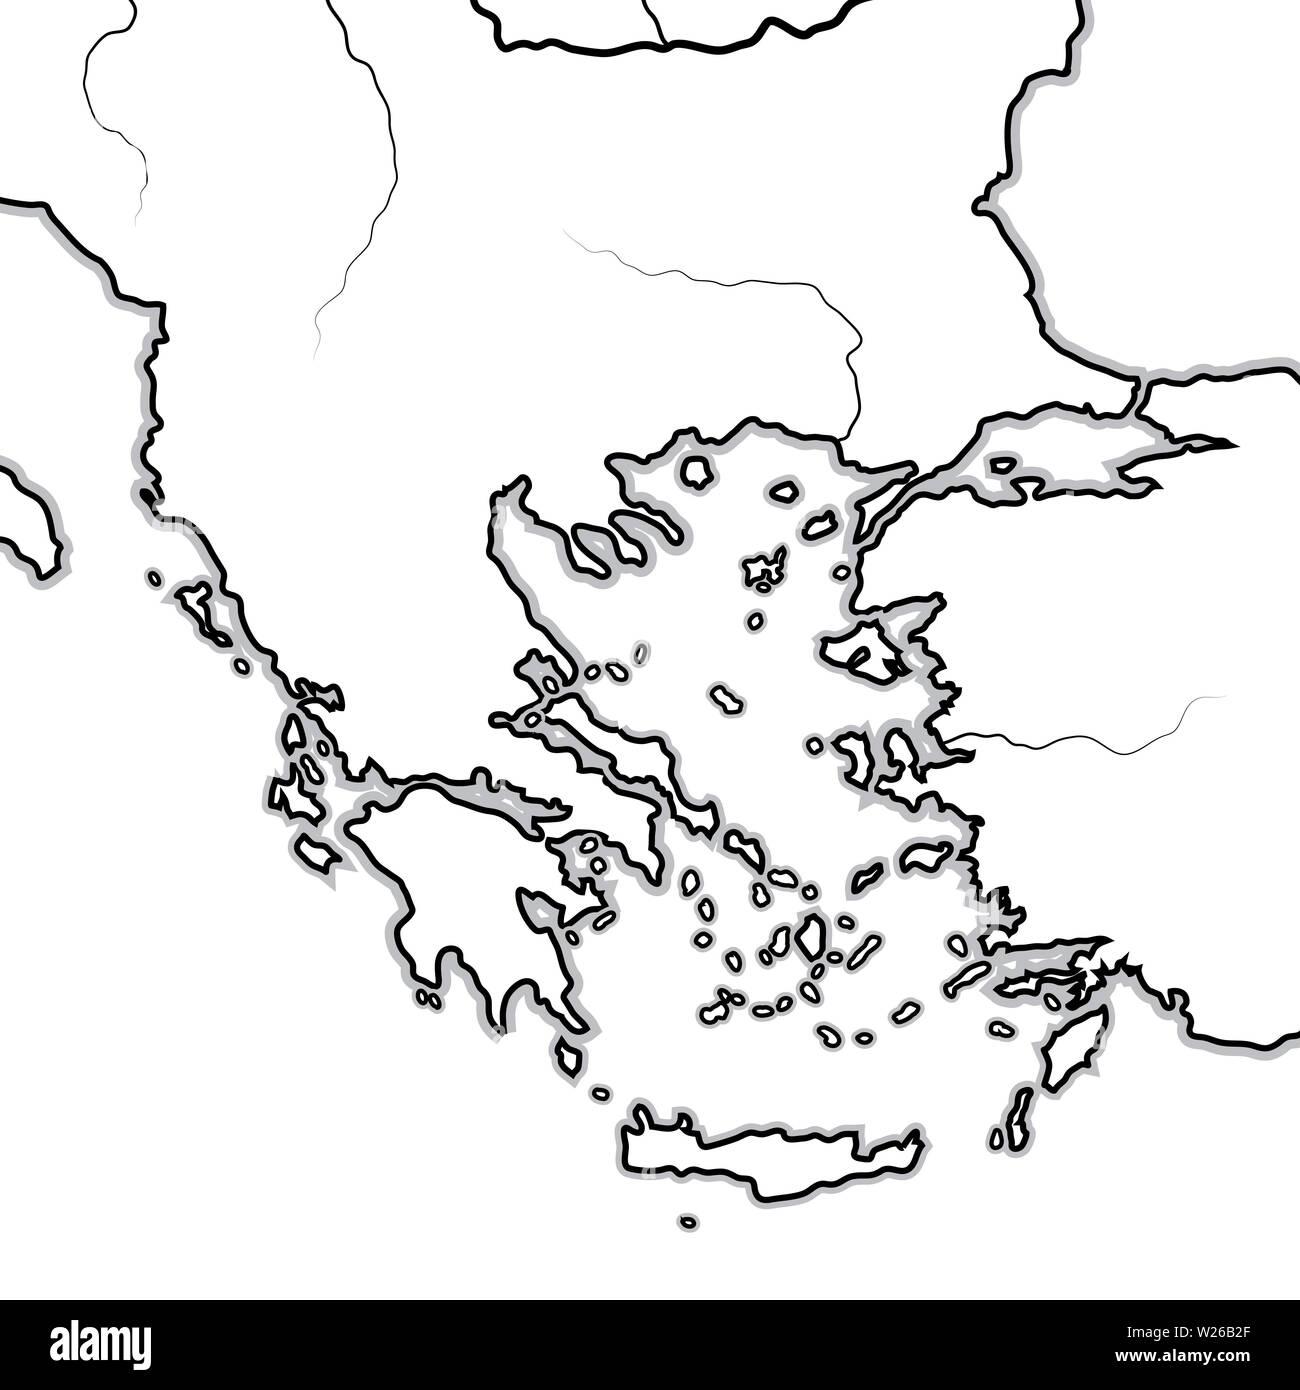 Map of The BALKAN / GREEK Lands: Greece (as), Balkans ... Peloponnesus Greece Map on sea of marmara greece map, magna graecia greece map, mount olympus greece map, attica greece map, thessaly greece map, macedonia greece map, hellespont greece map, ithaca greece map, delphi greece map, mycenae greece map, sparta greece map, ionia greece map, phocis greece map, pergamon greece map, boeotia greece map, laconia greece map, thrace greece map, troy greece map, epirus greece map, rhodes greece map,